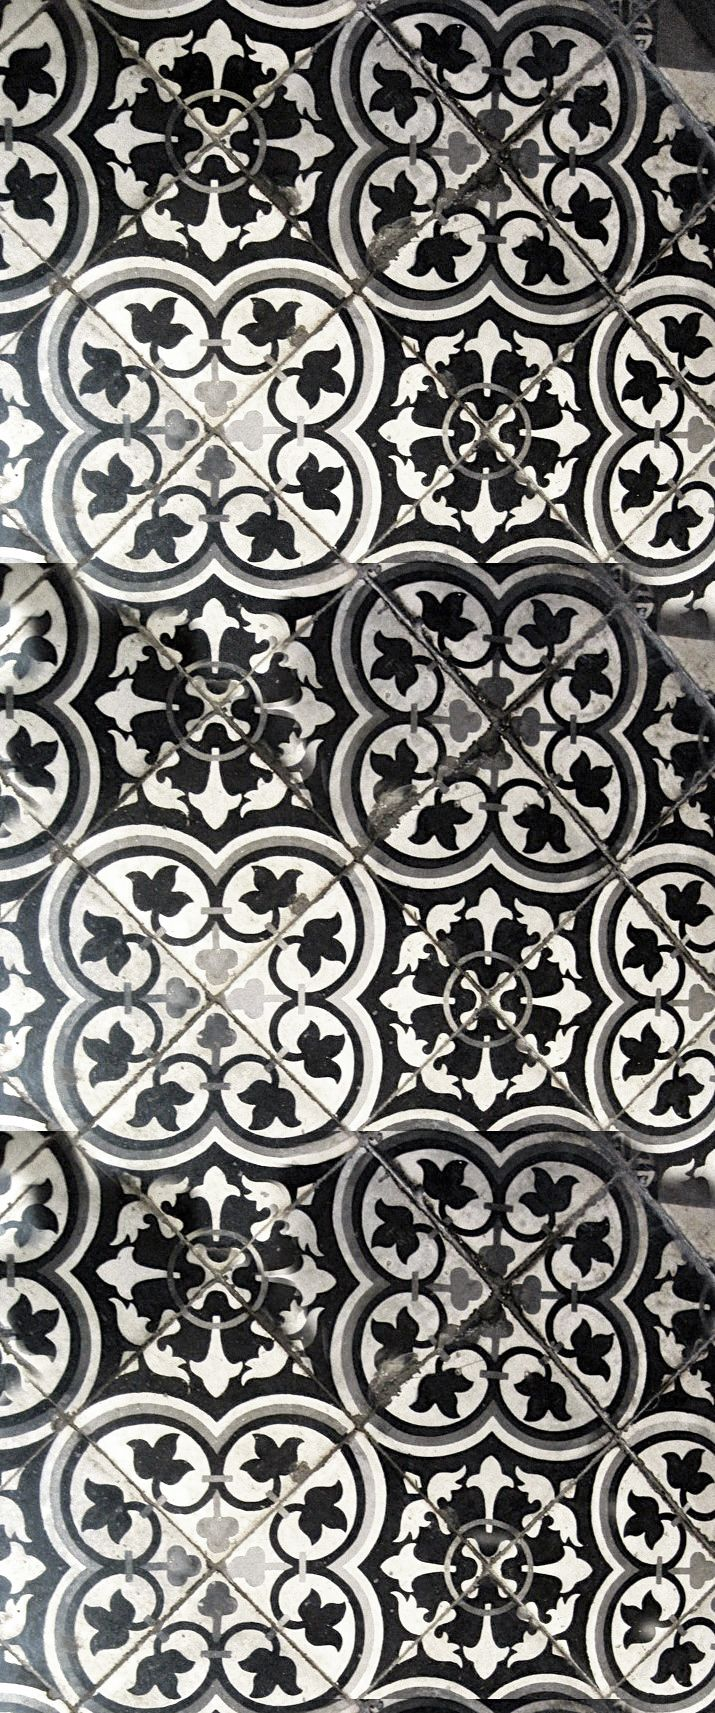 Tiles. OMG reminds me of Sevilla. Necesito para mi cocina